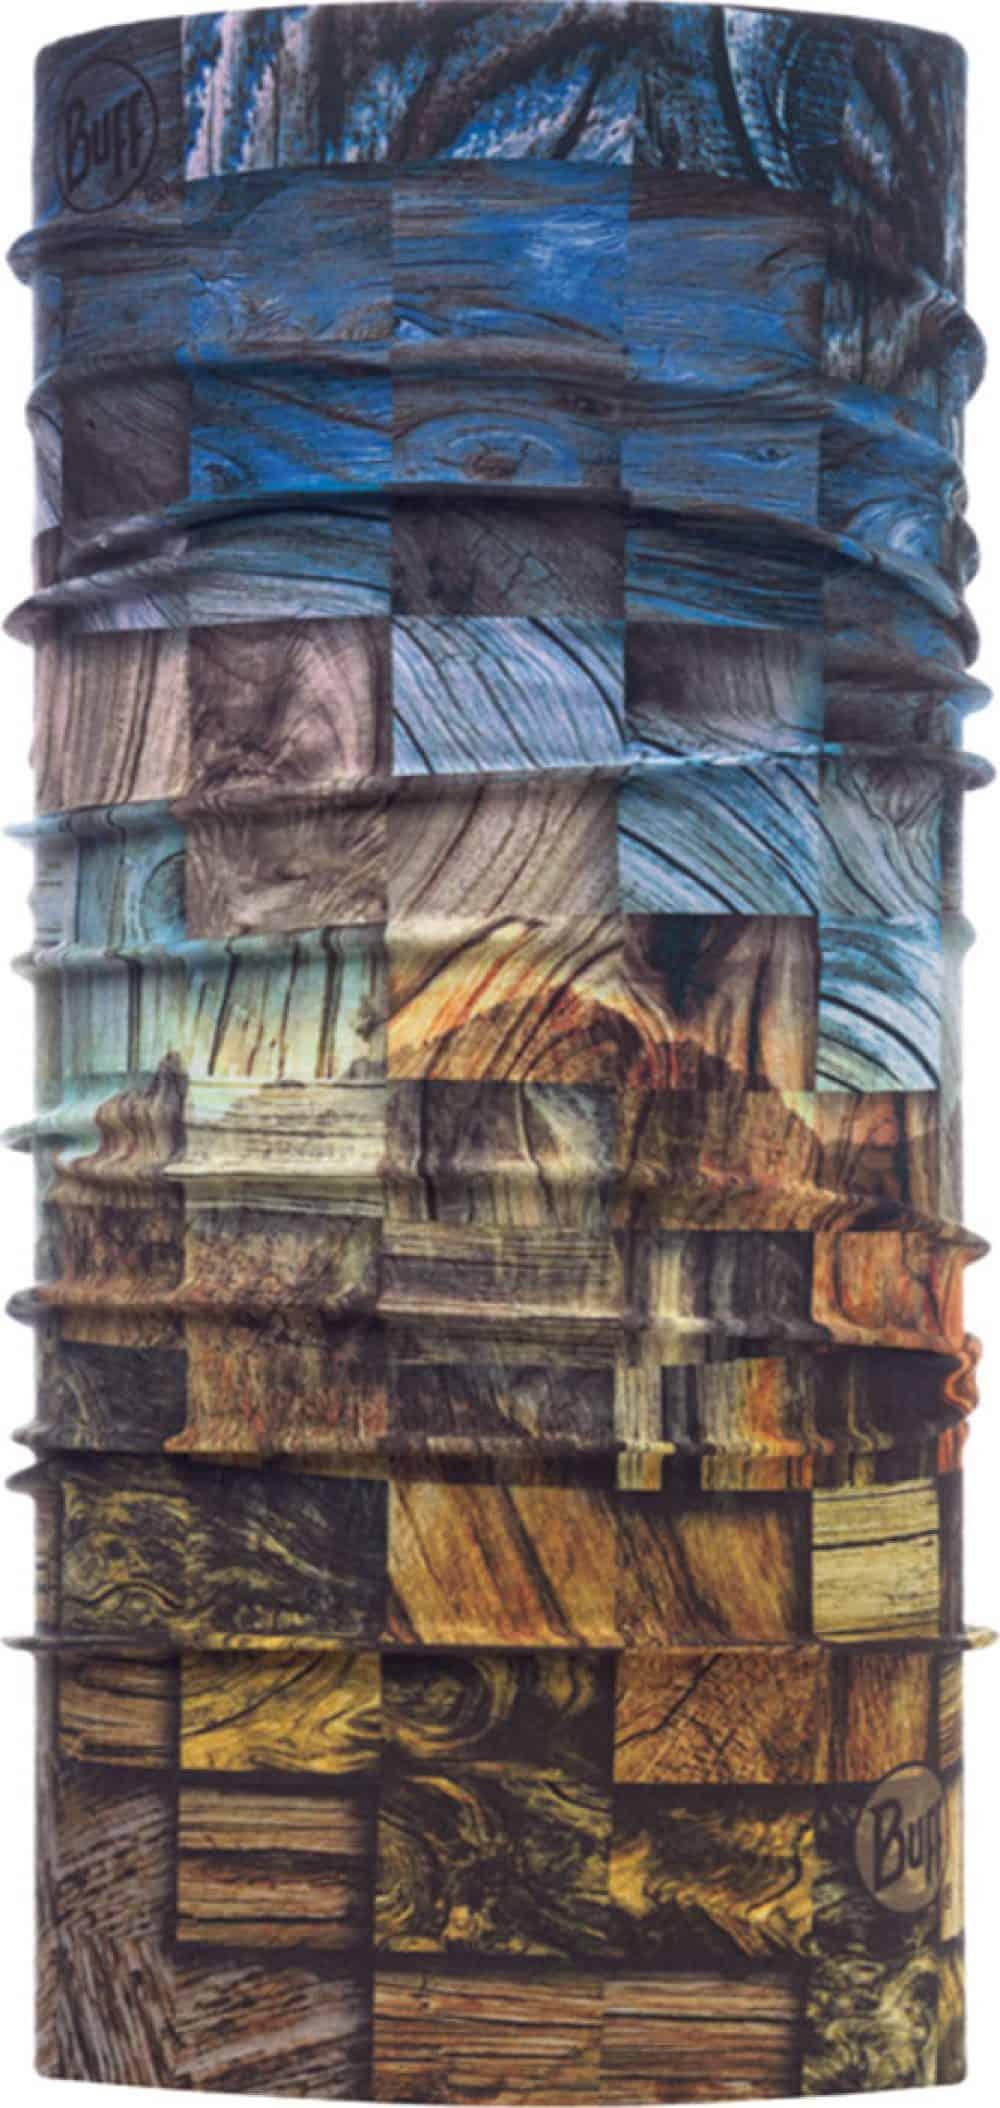 "Studio photo of the High UV Buff® design ""Wood Collage"". Source: buff.eu"